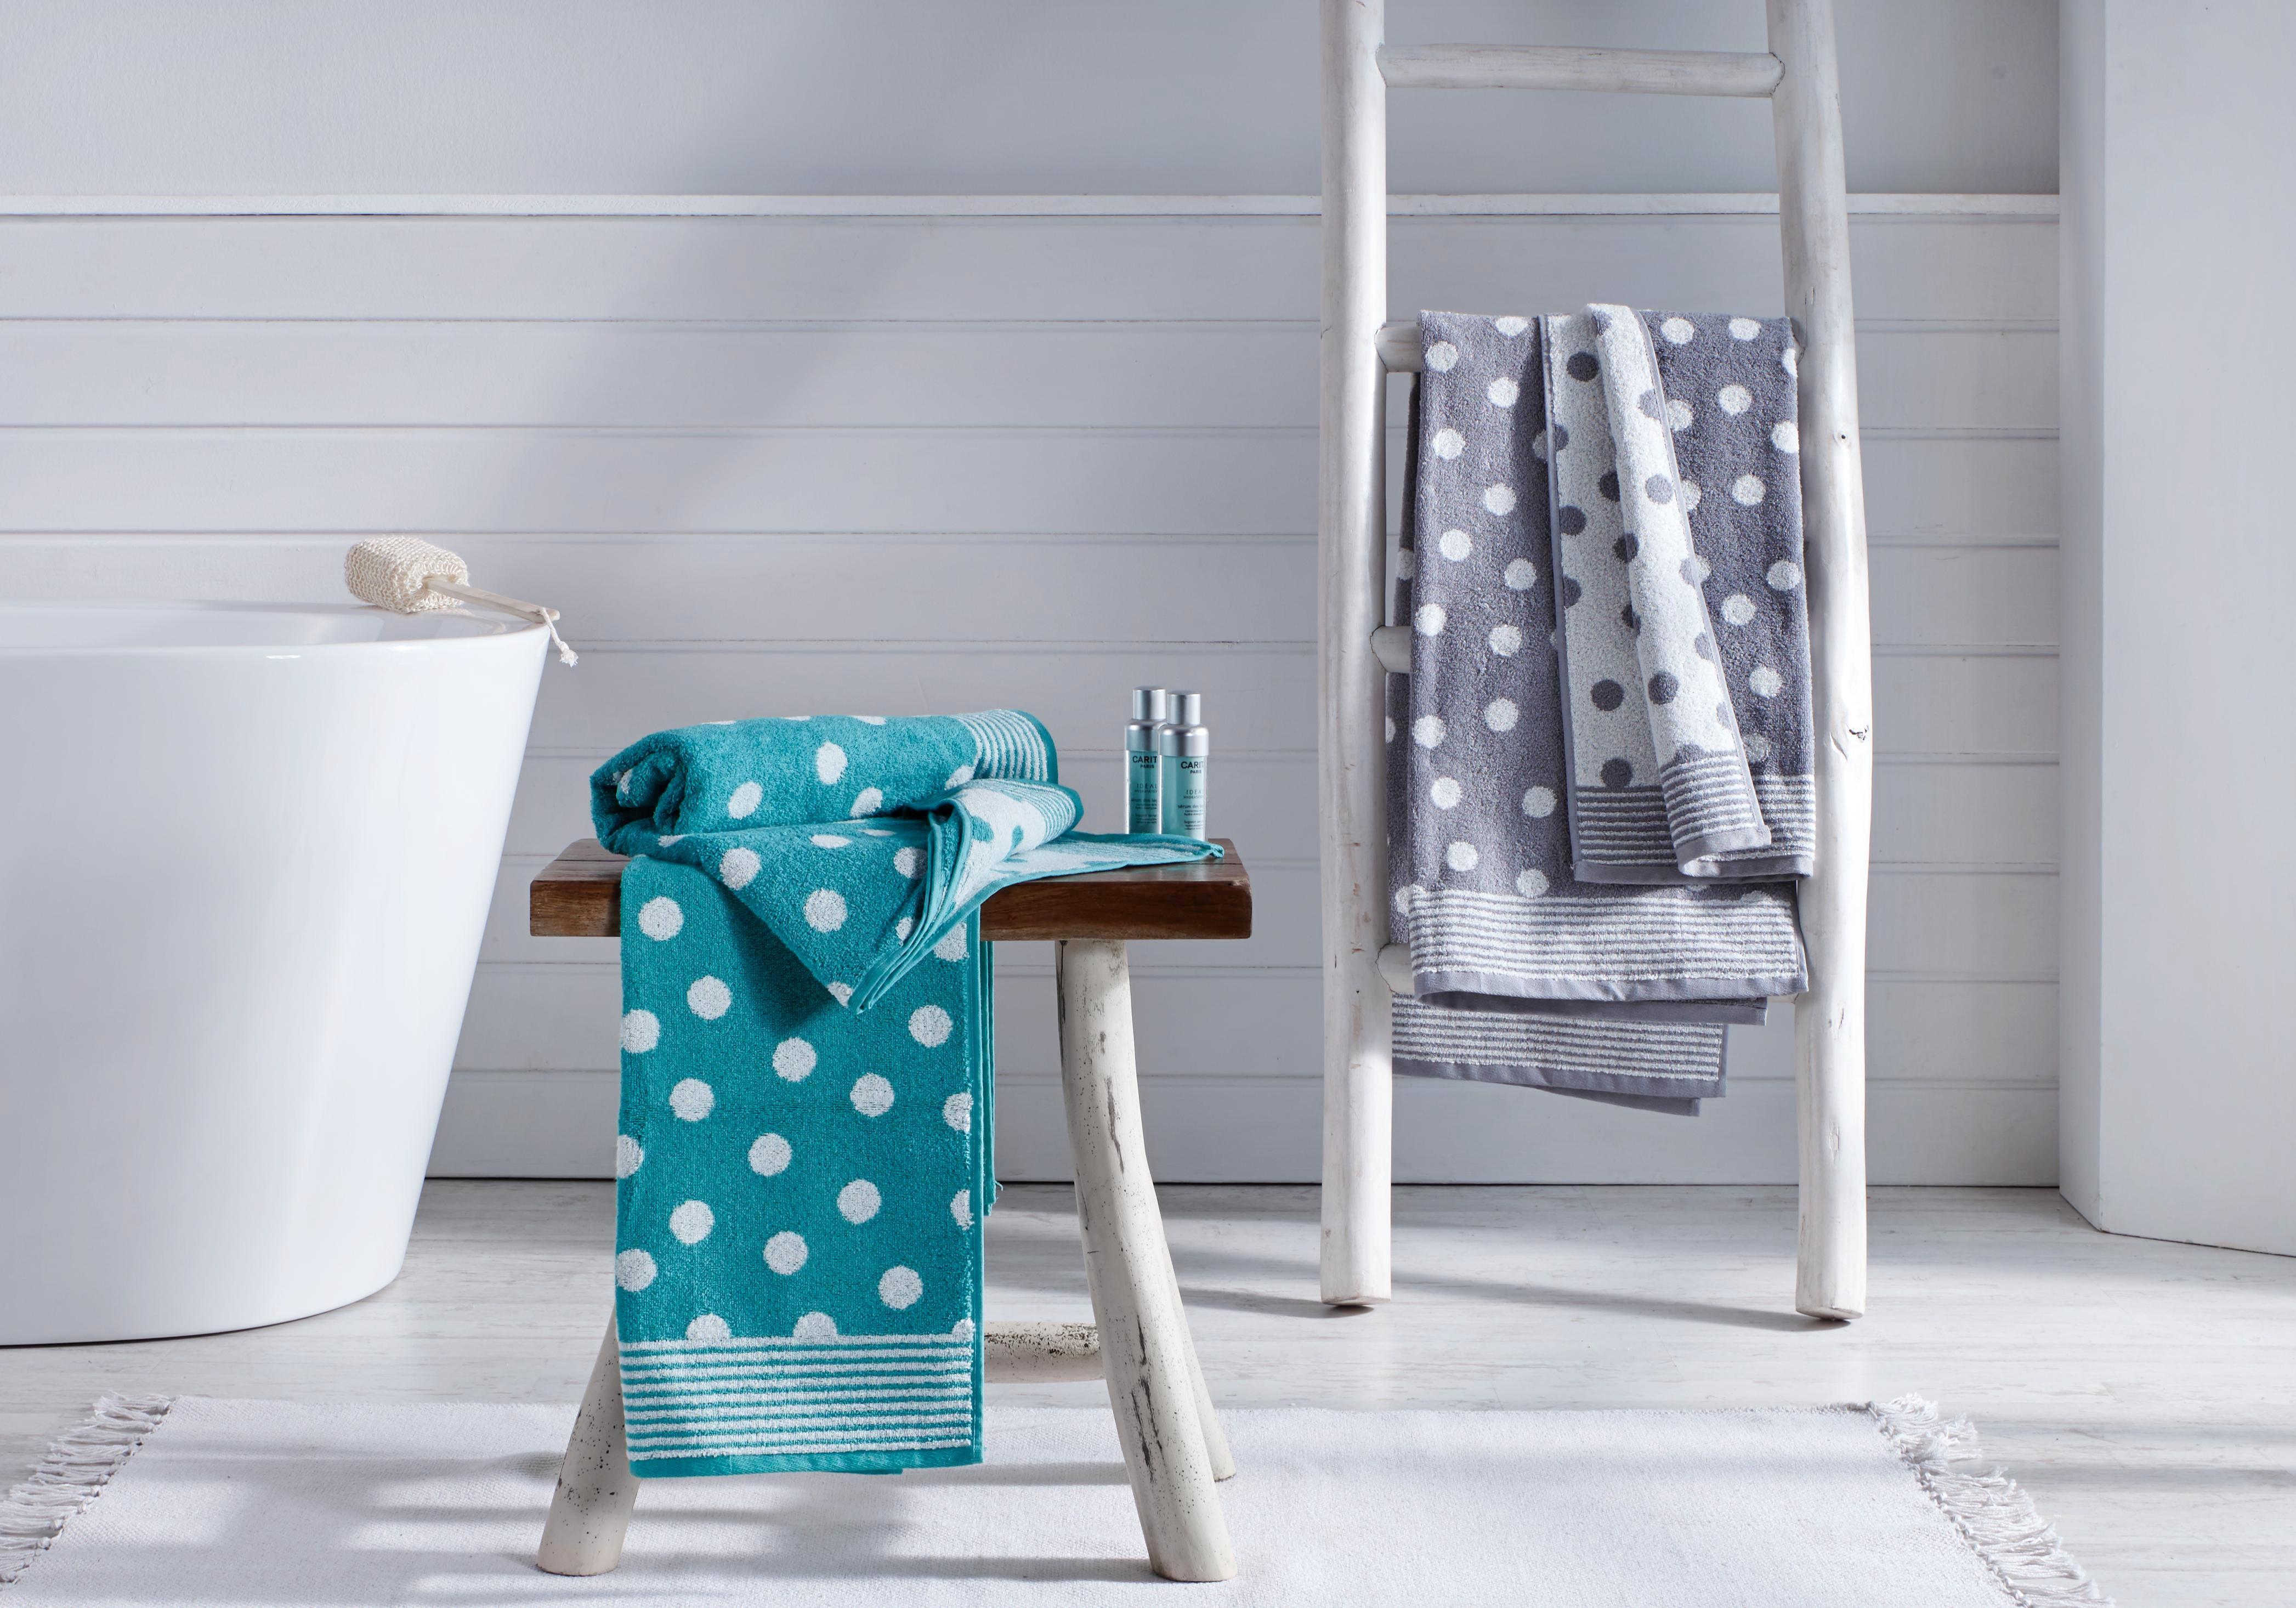 Duschtuch Dyckhoff Dots 70x140cm - Weiß/Grau, KONVENTIONELL, Textil (70x140cm) - DYCKHOFF